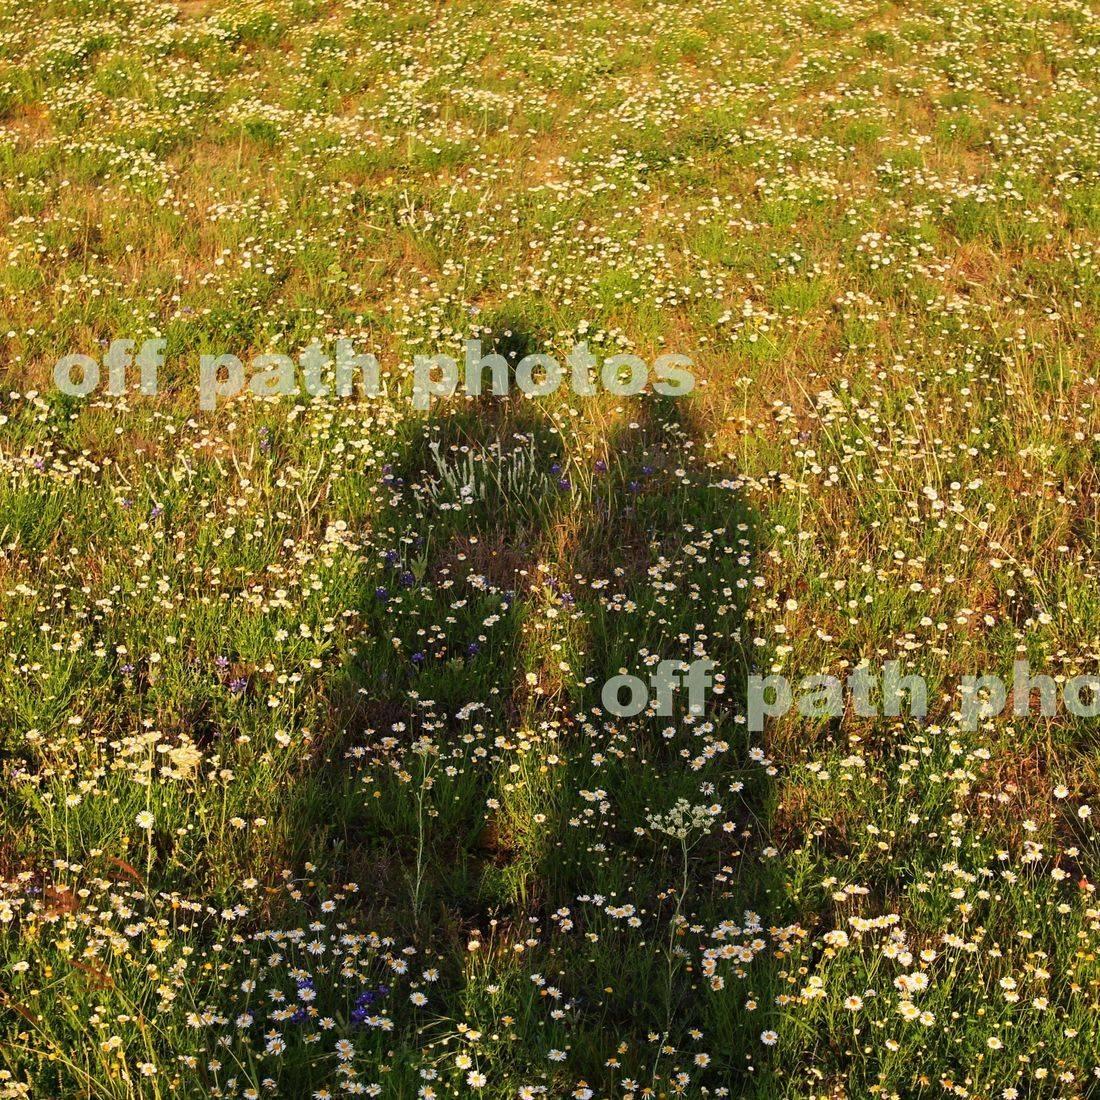 photography, nature, wildflowers, love, romance, field, shadows, man, woman